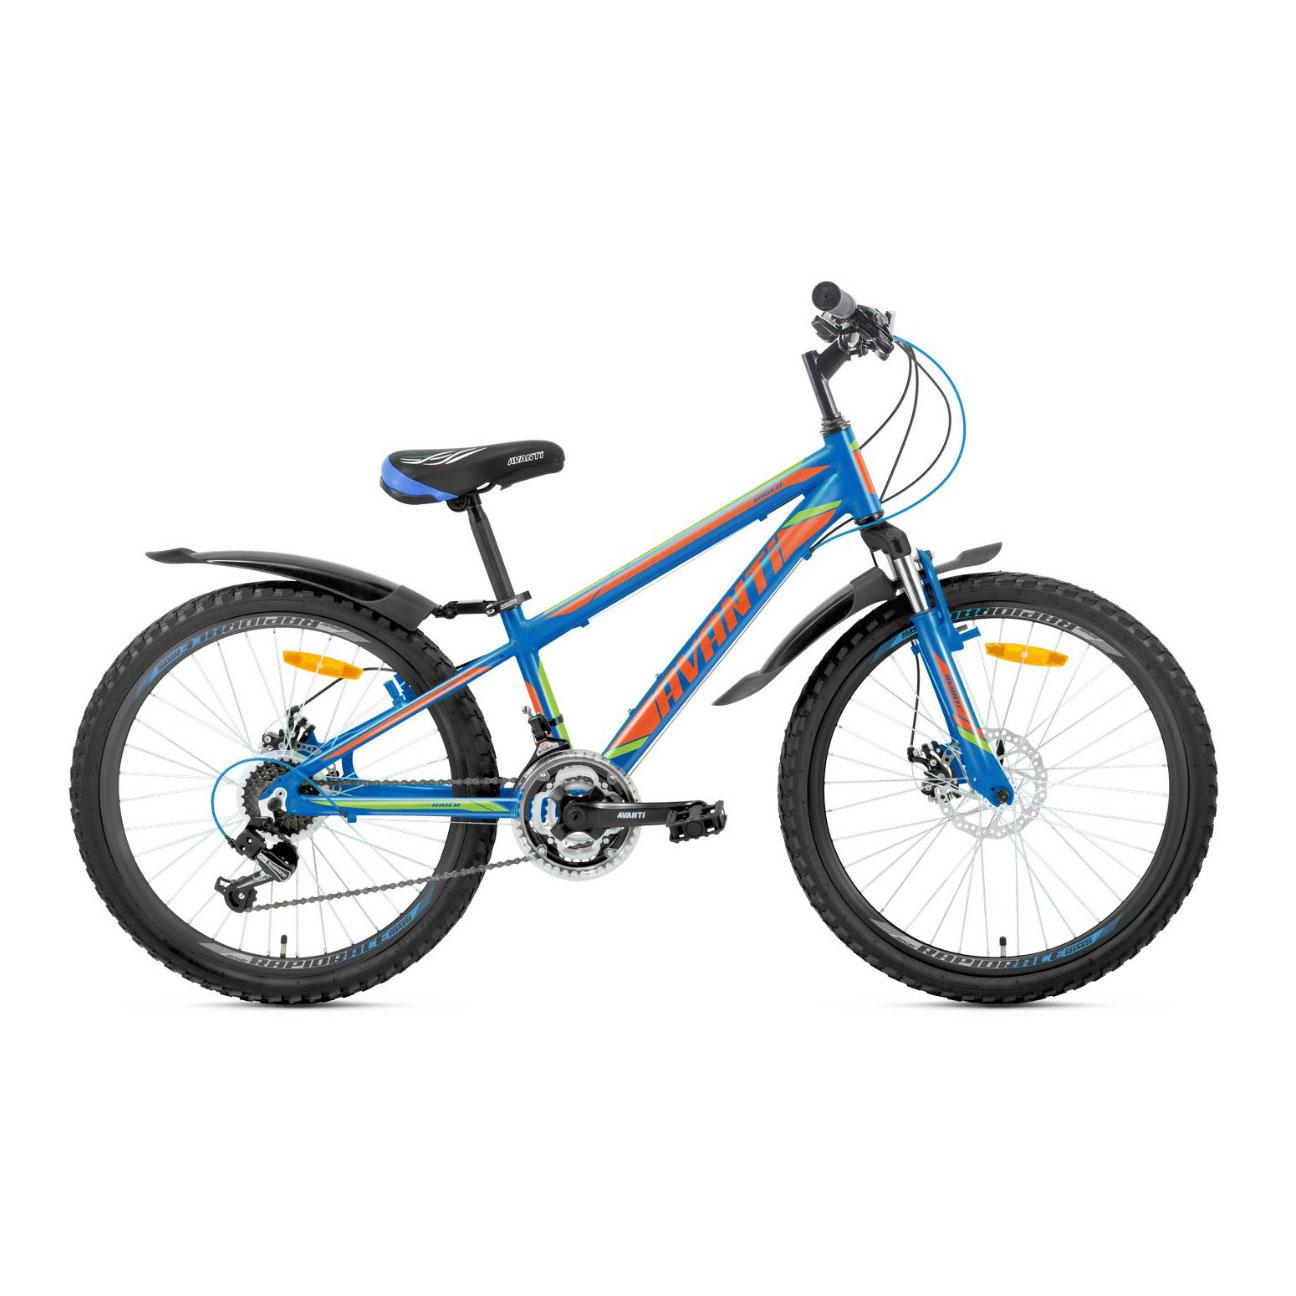 Фото Подростковый Велосипед 24 Avanti Rider disk 2018 черно-оранжево-синий